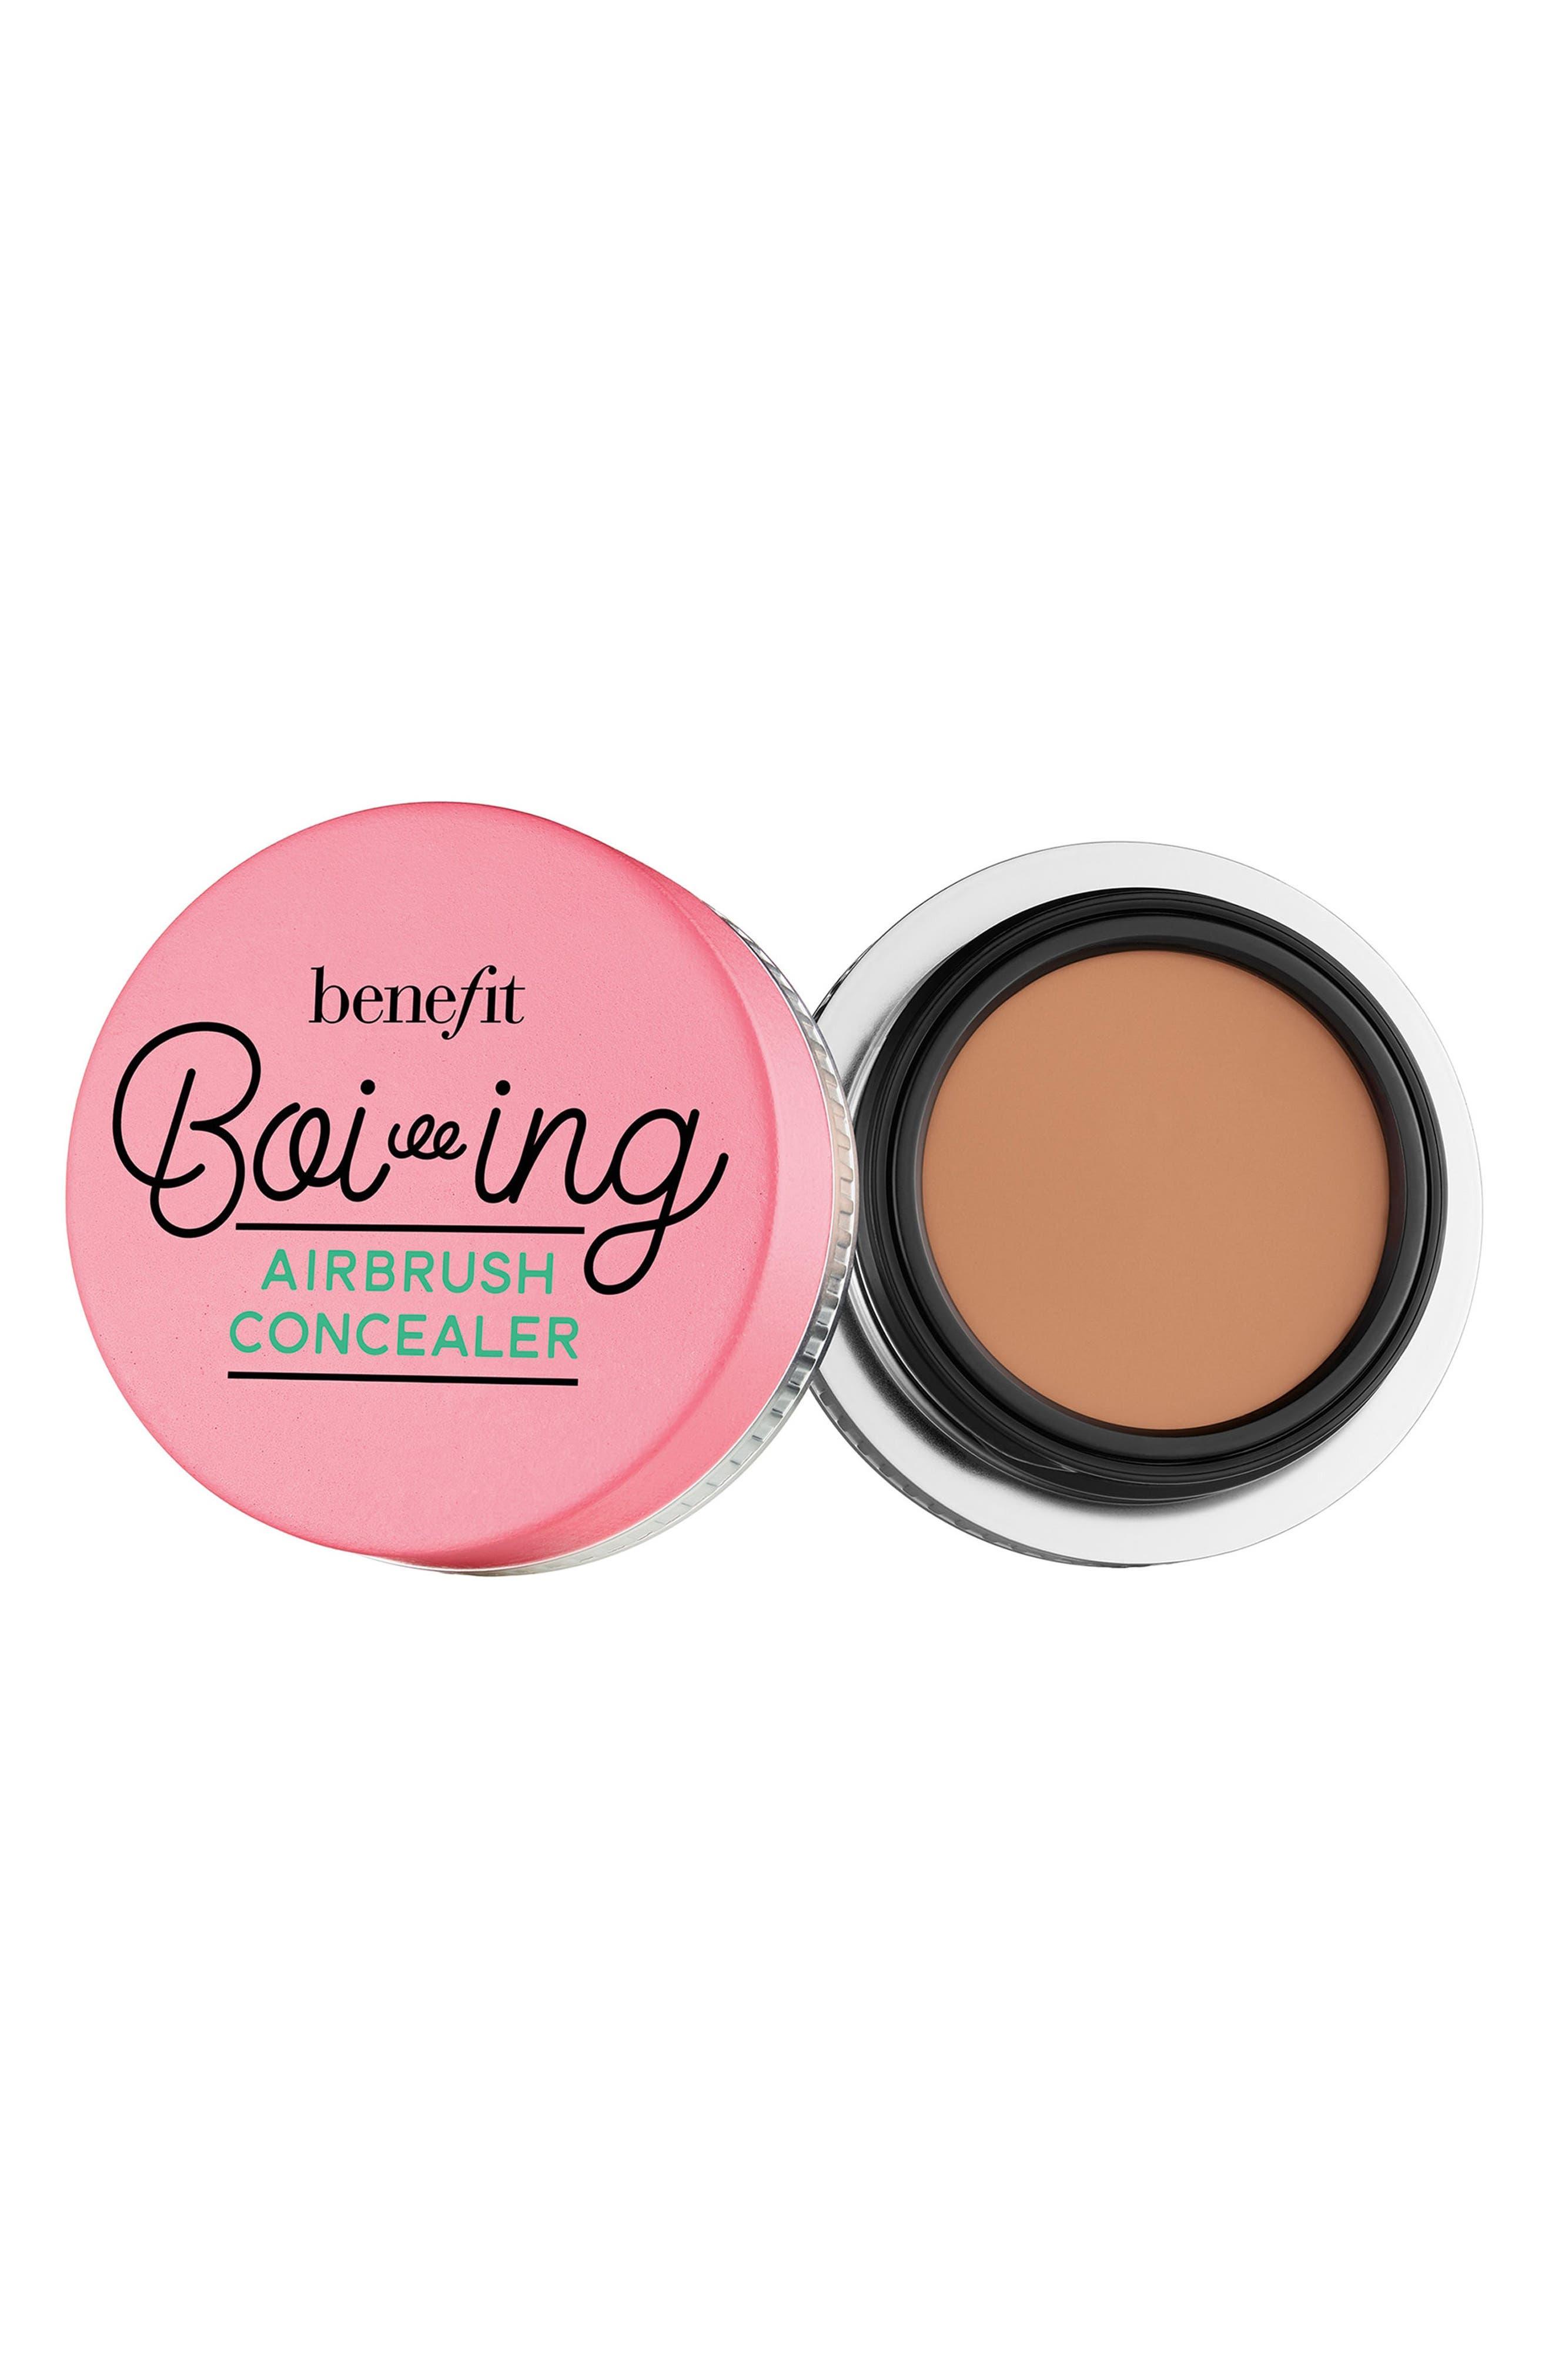 BENEFIT COSMETICS, Benefit Boi-ing Airbrush Concealer, Main thumbnail 1, color, 04 - MEDIUM / TAN